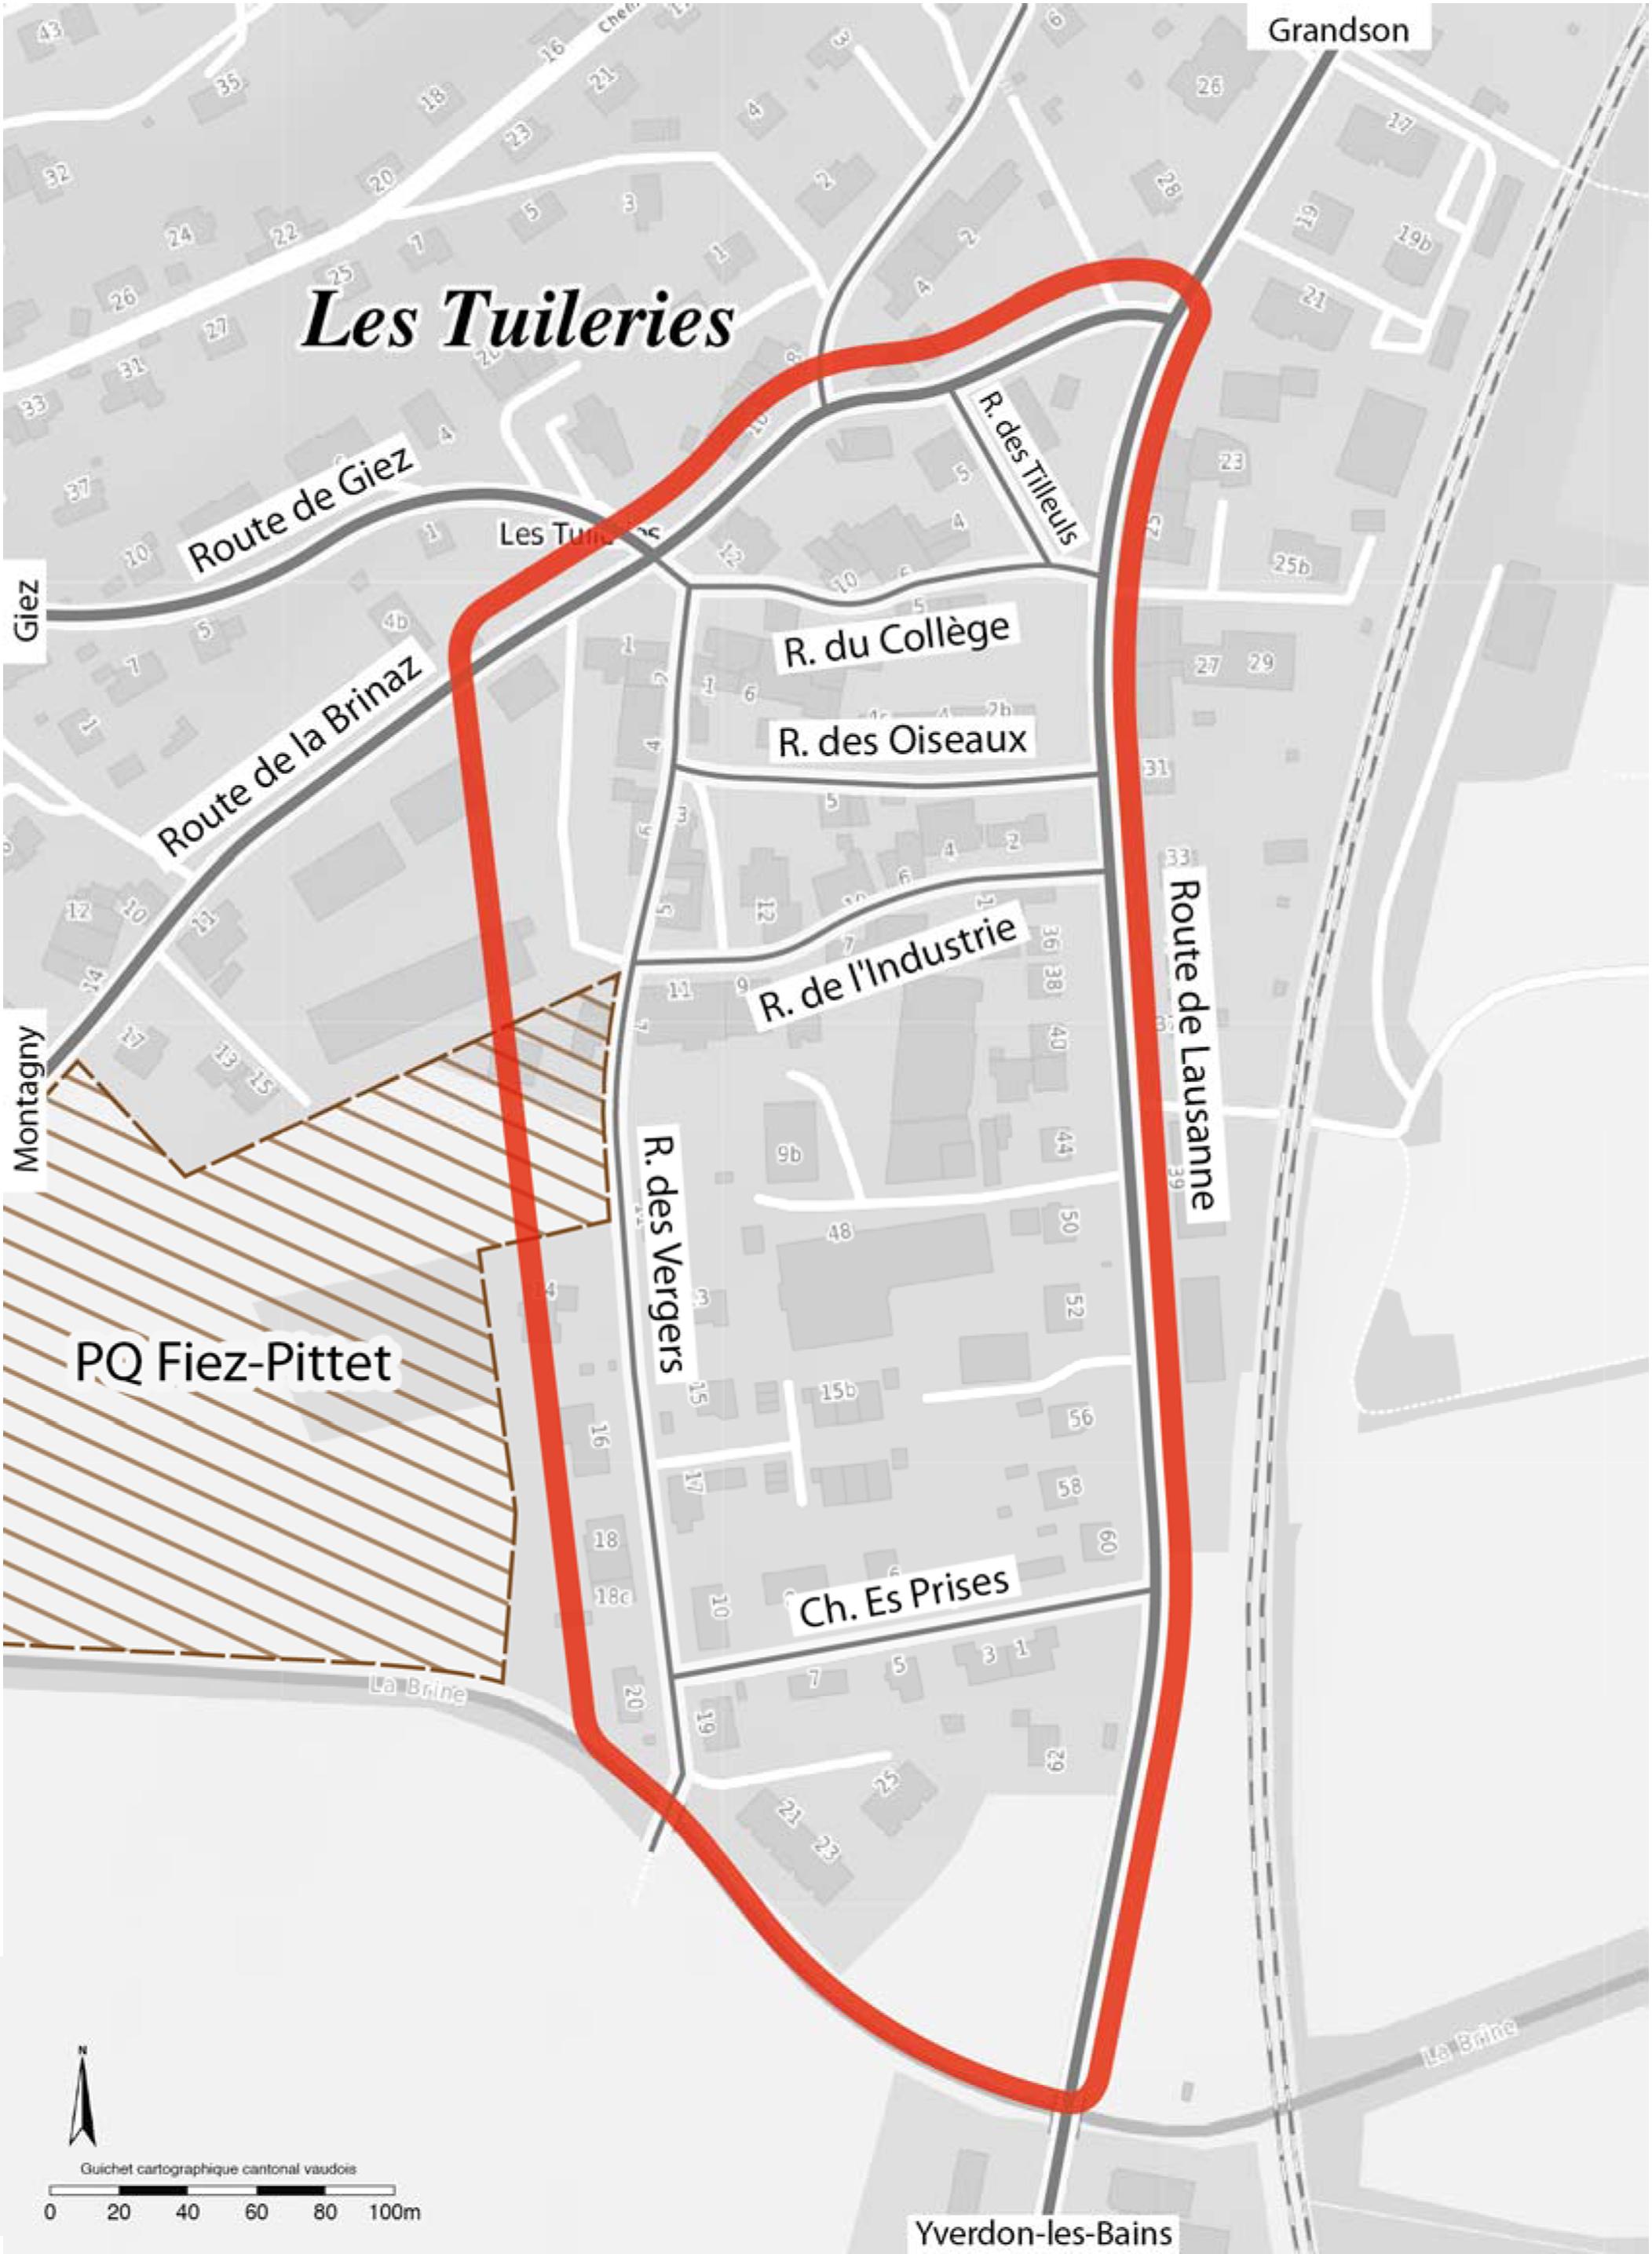 image_grandson_plan_centre_tuileries